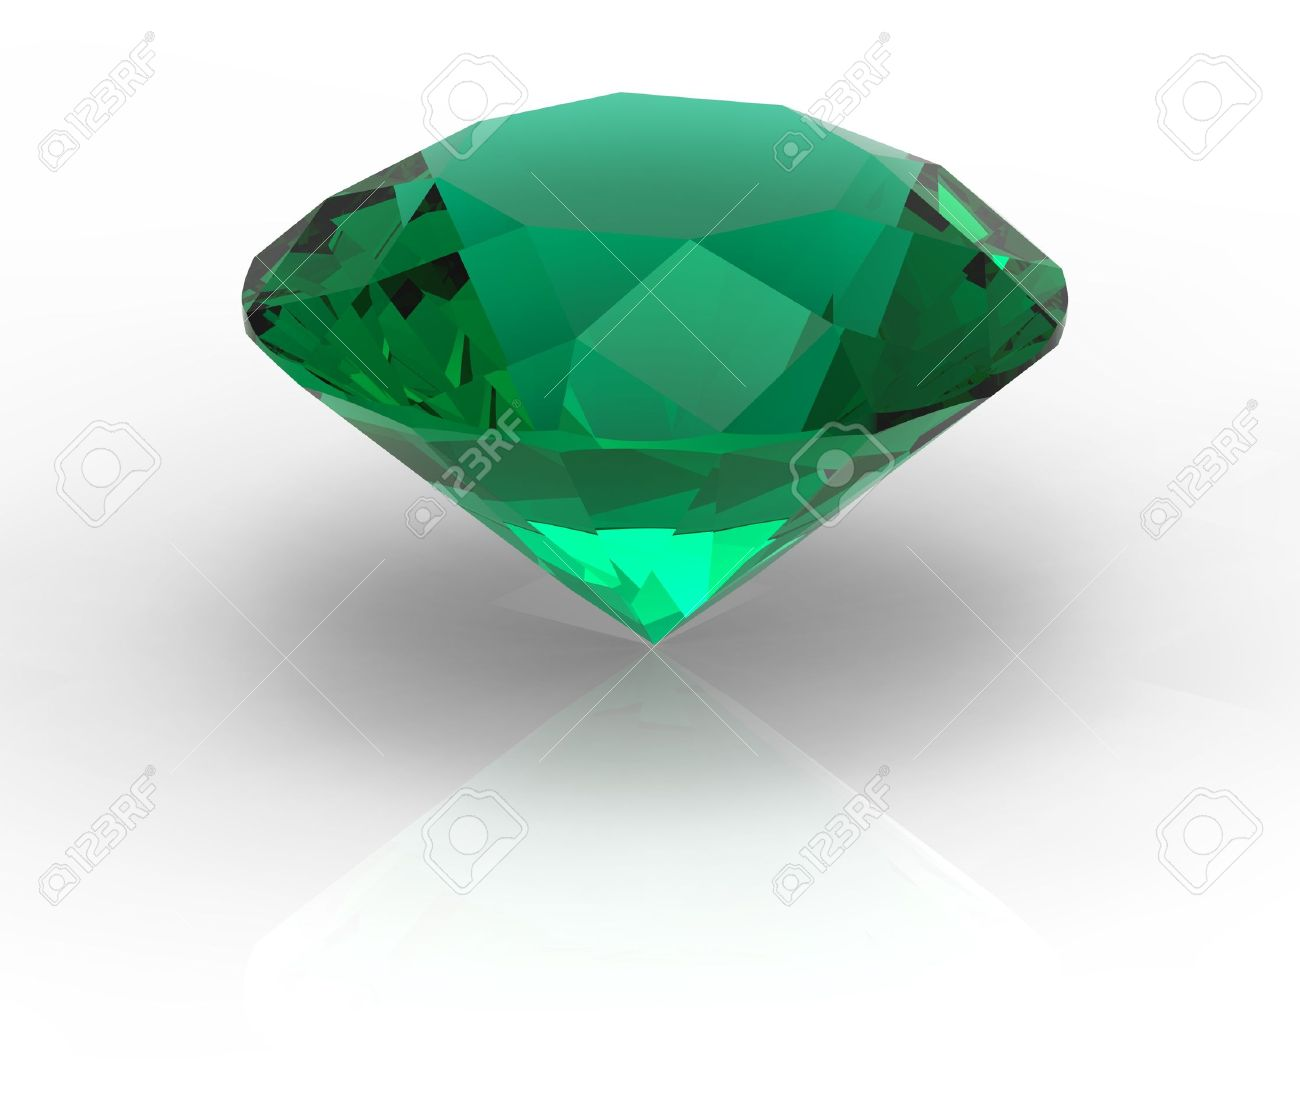 Green diamond emerald gemstone isolated on white with shadows Stock Photo - 16451211